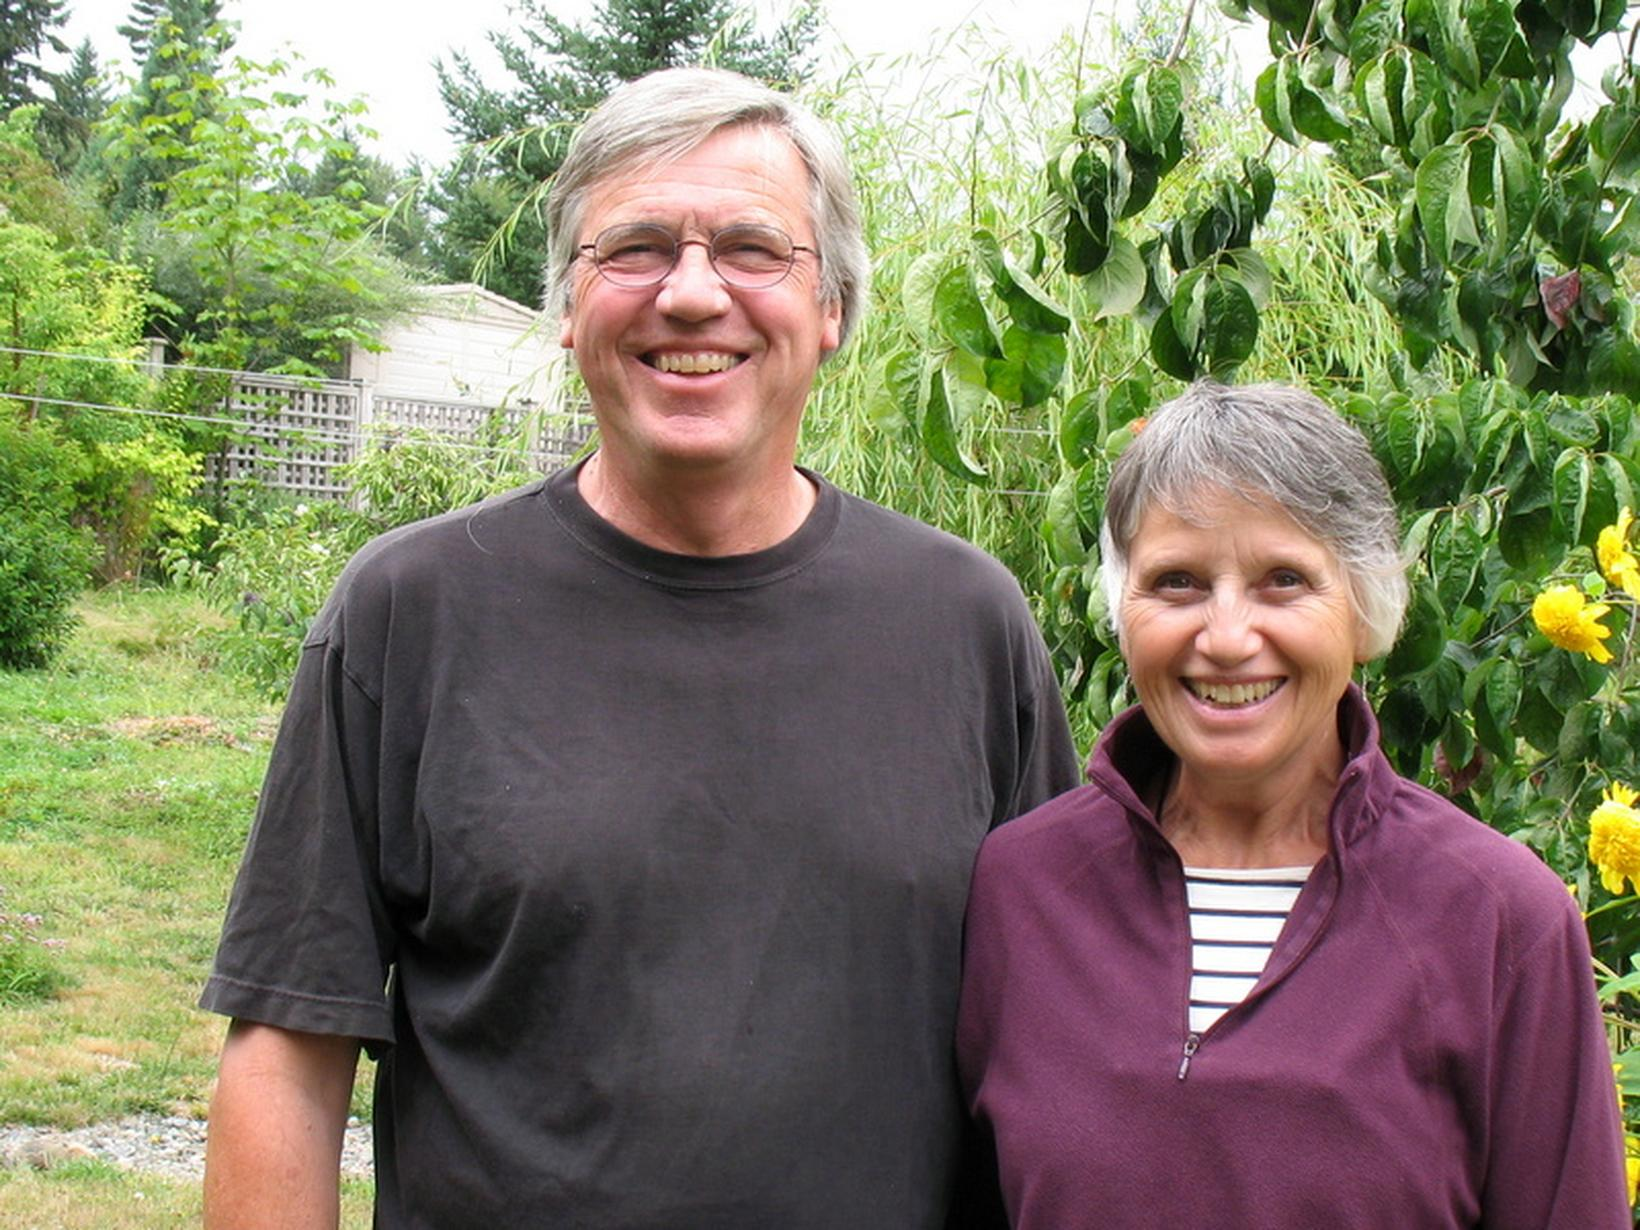 Philip & Emily from Courtenay, British Columbia, Canada